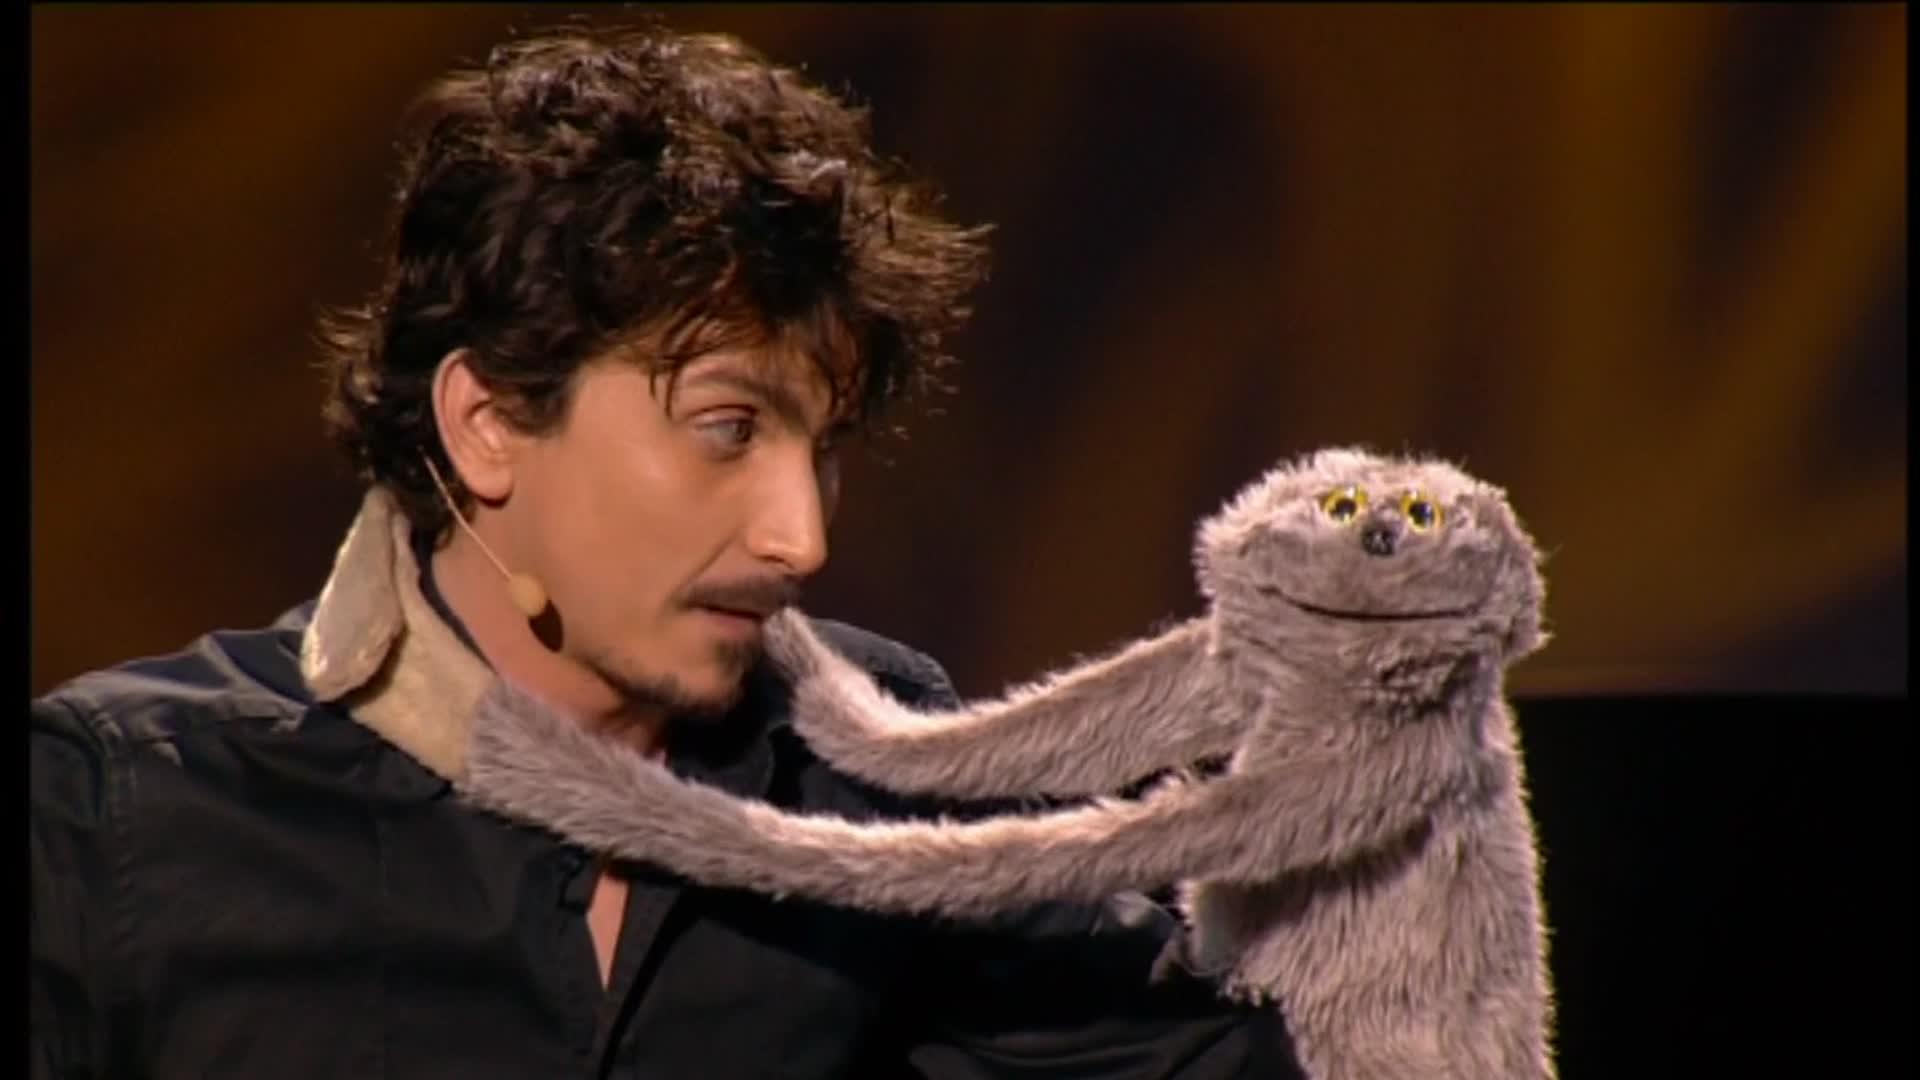 Arnaud Tsamère - La ventriloquie